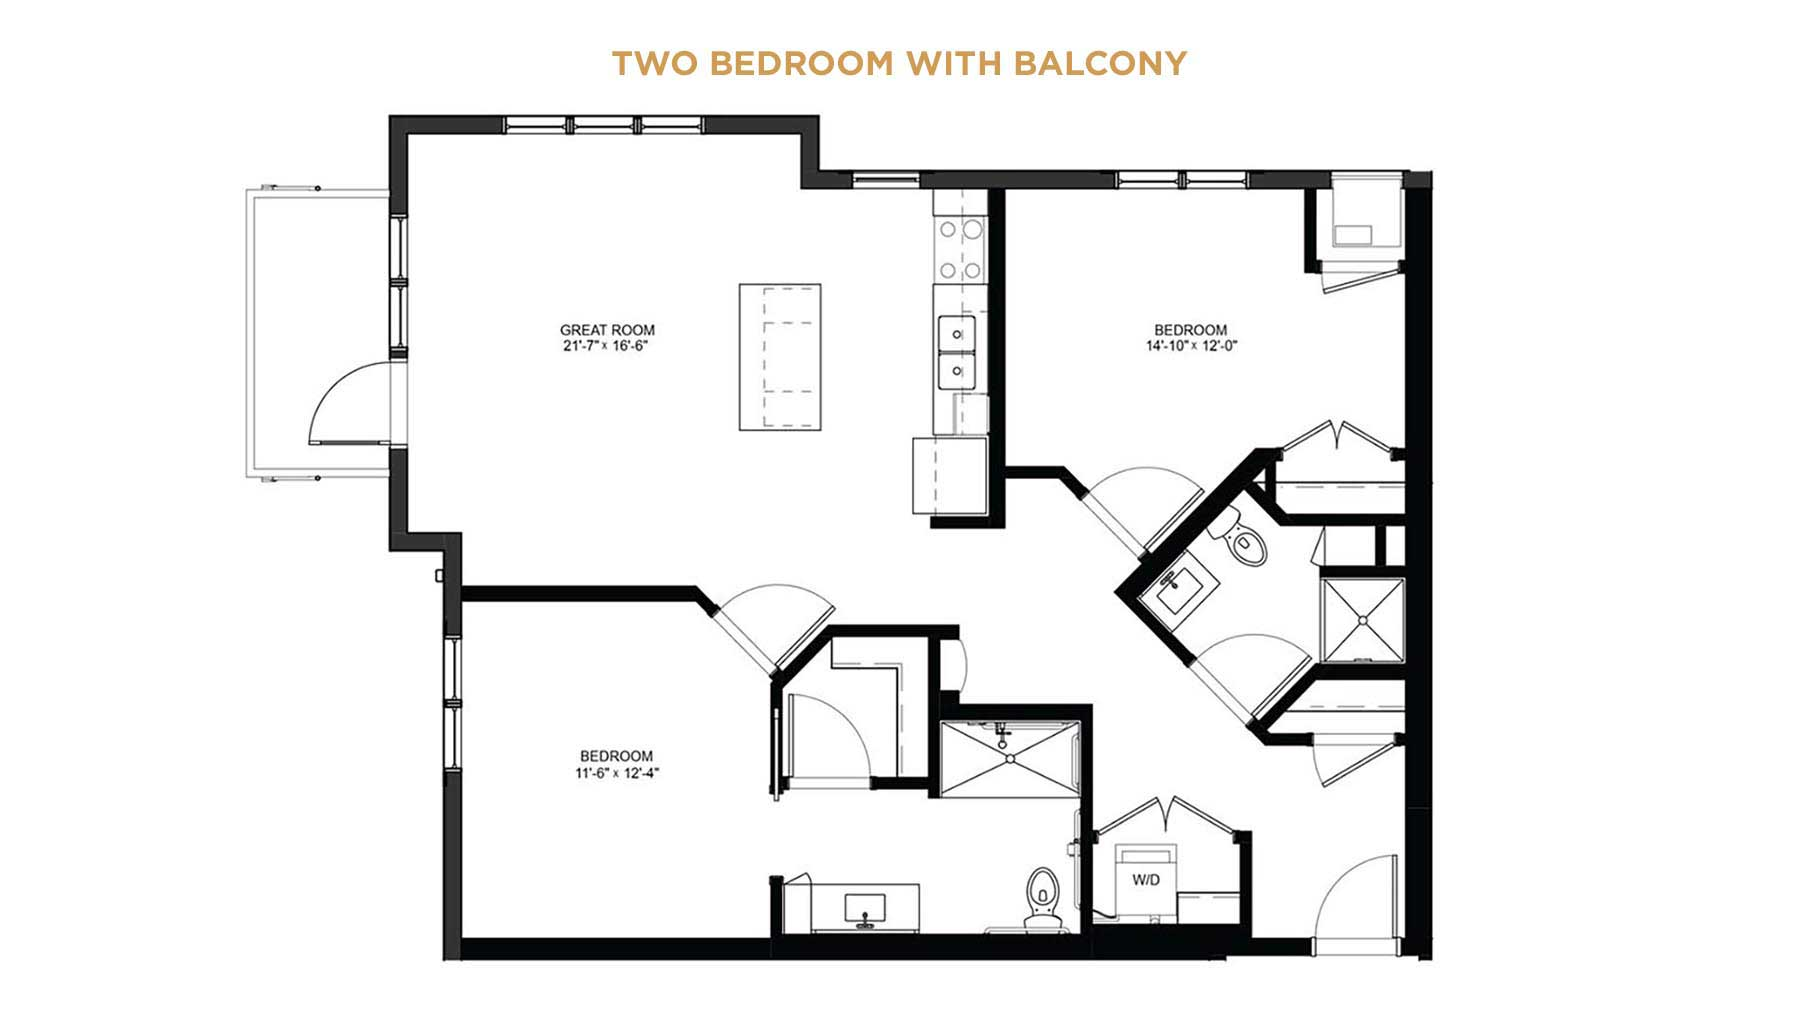 Two bedroom with balcony floorplan